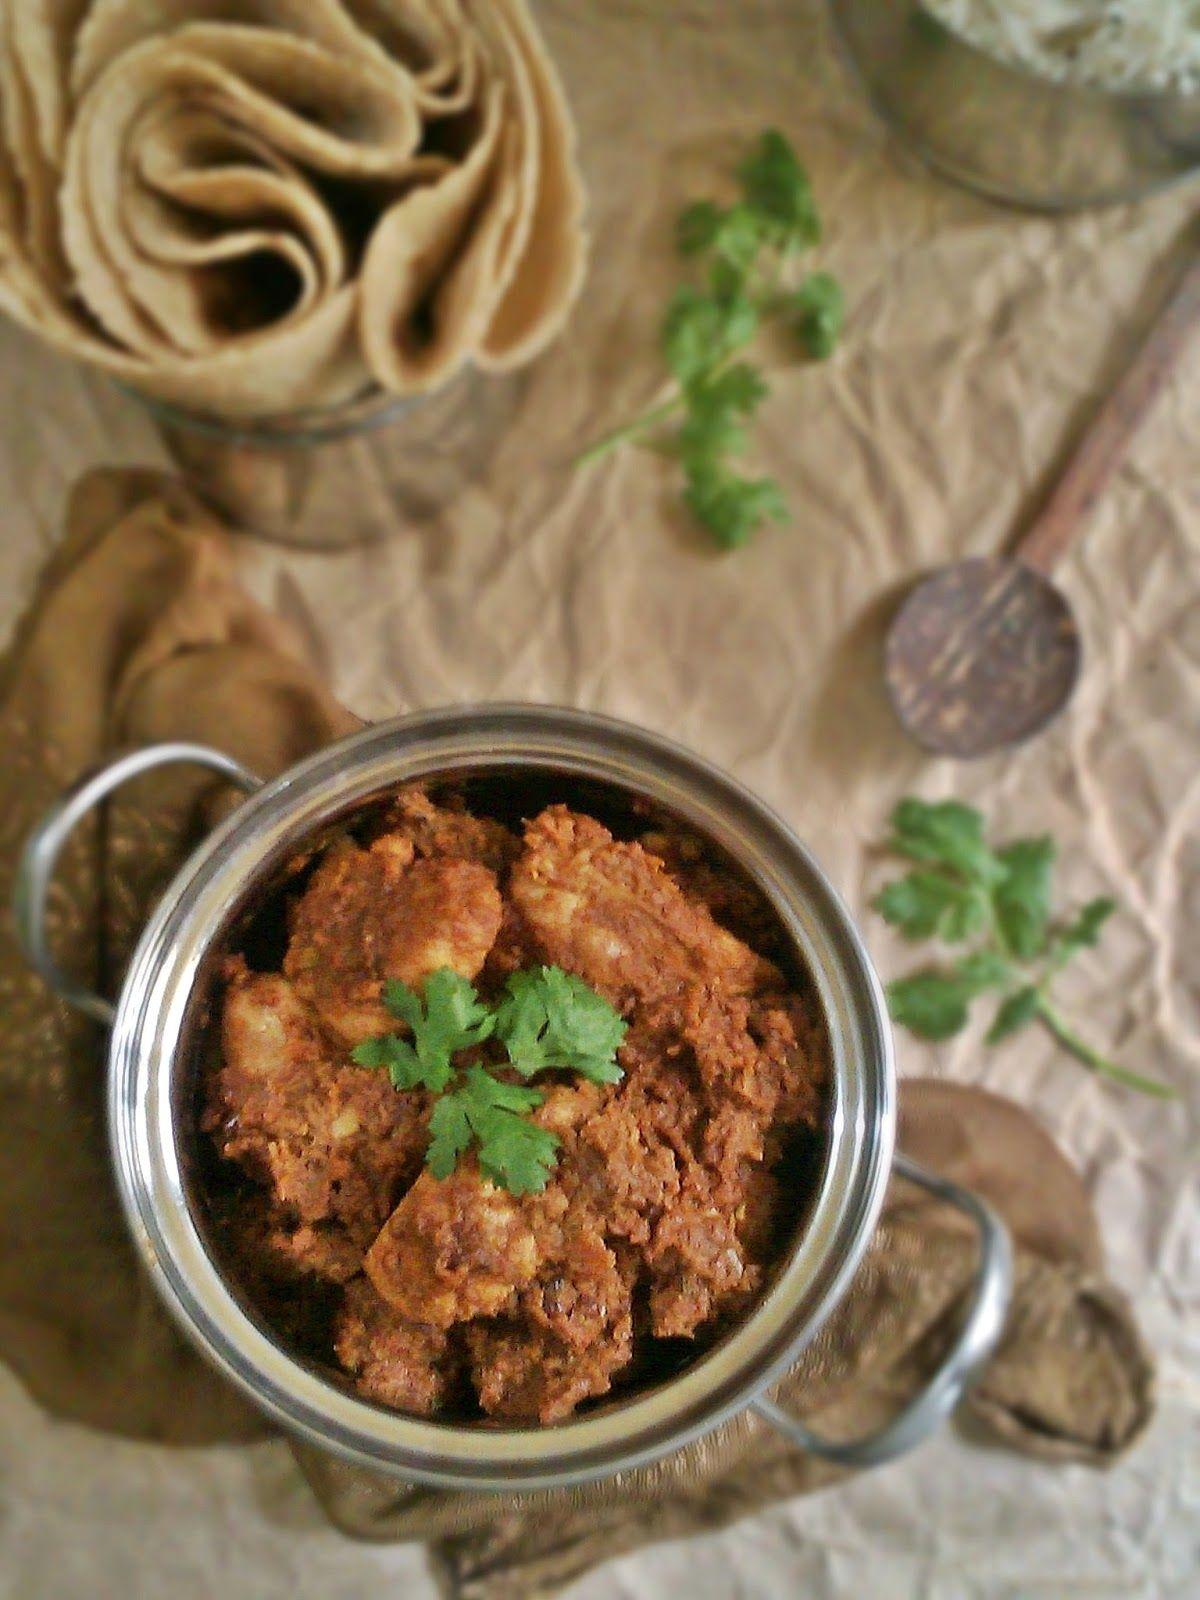 The Humpty Dumpty Kitchen: Punjabi Style Chicken Curry by @Priya Elias